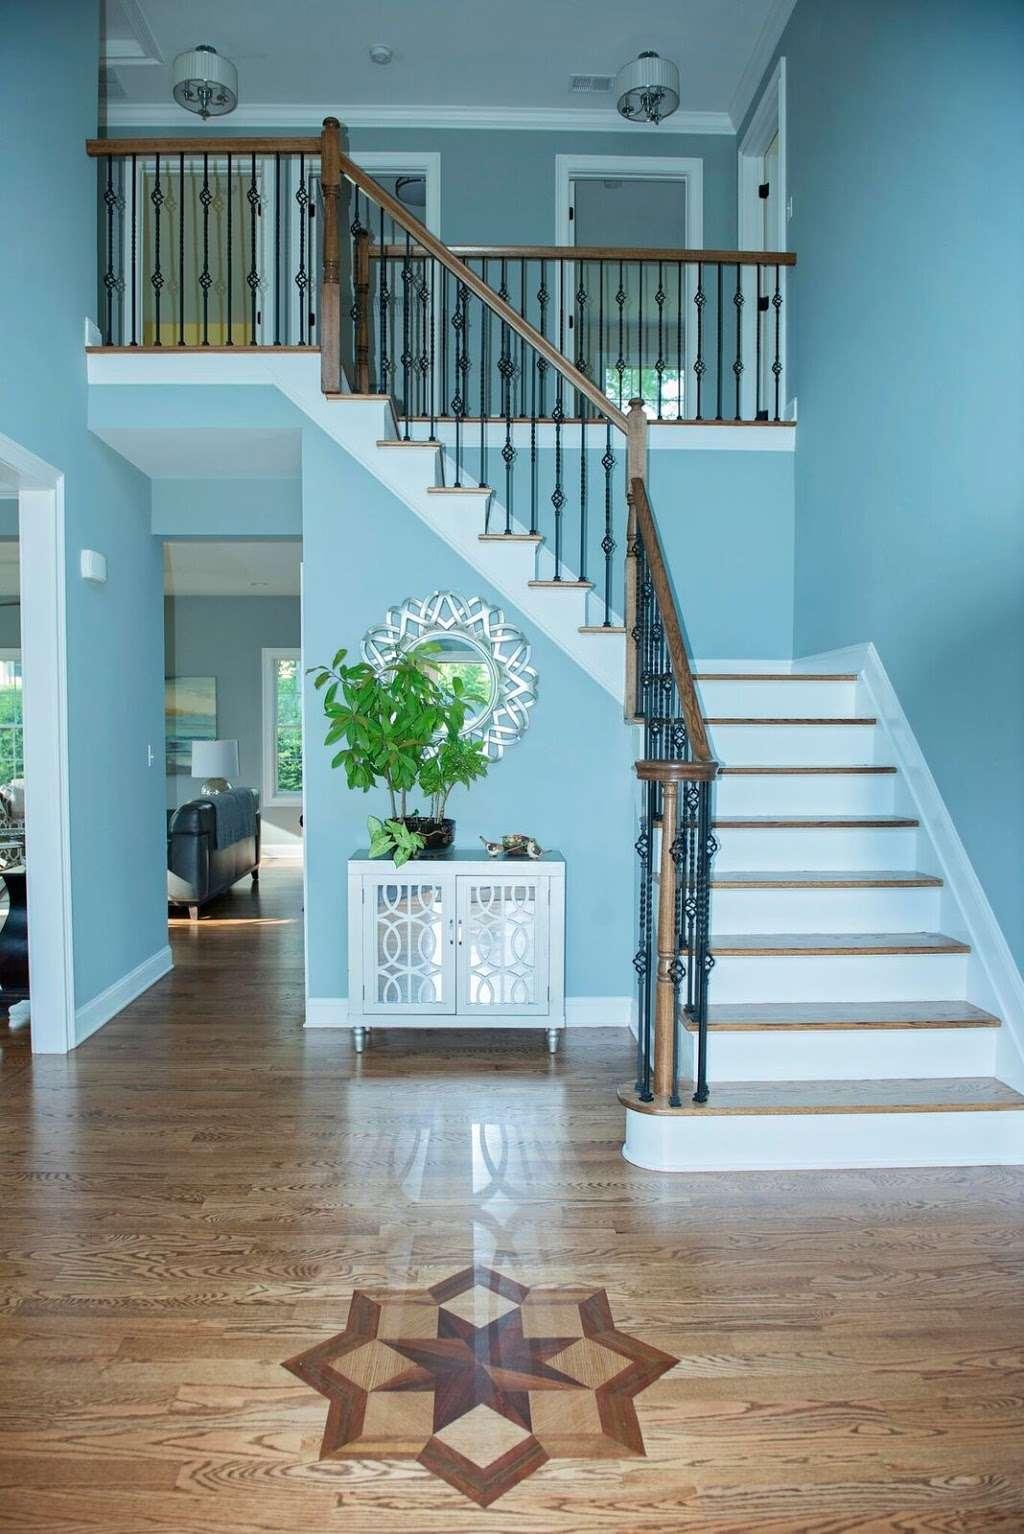 Reserve At Belair - real estate agency  | Photo 8 of 10 | Address: 60 Haggerty Dr, West Orange, NJ 07052, USA | Phone: (973) 736-5757